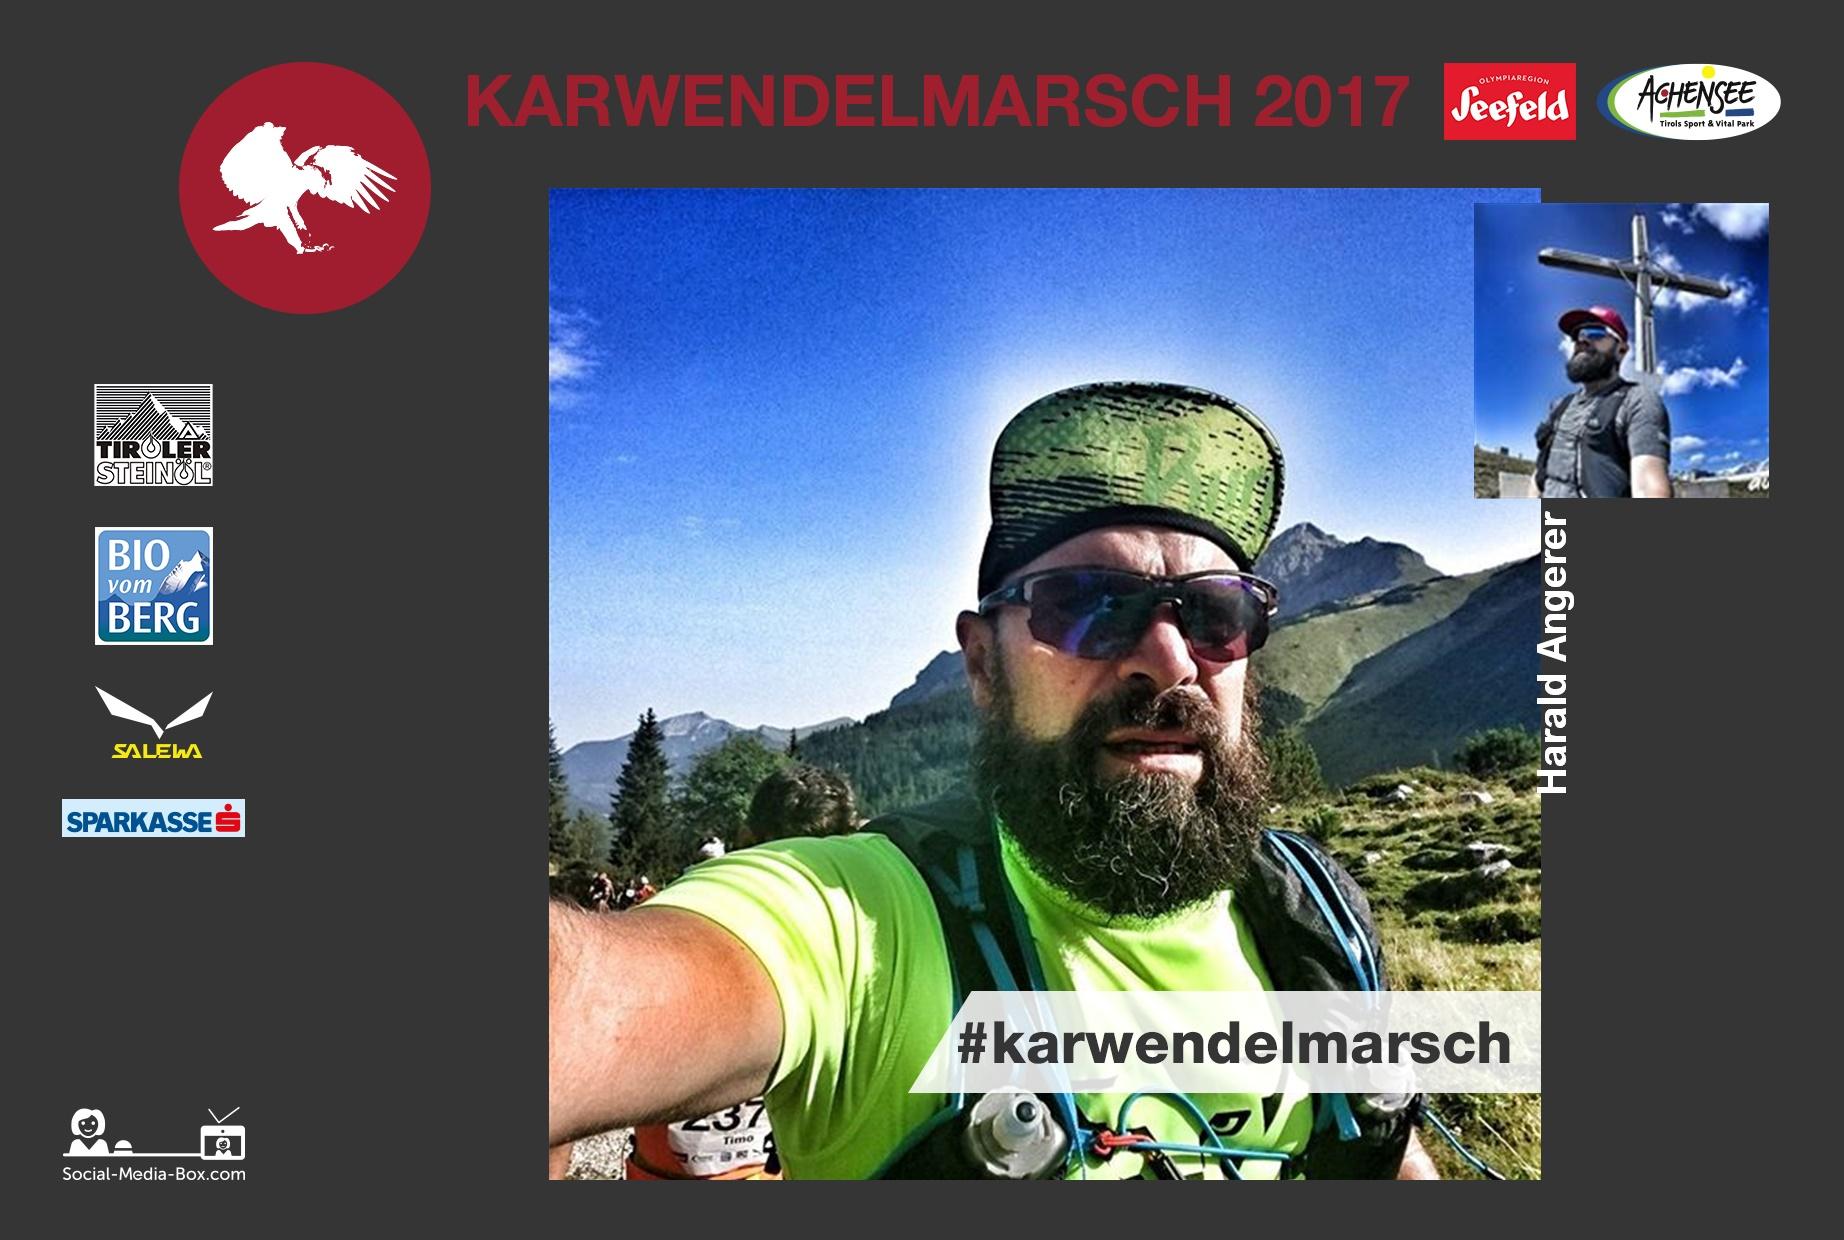 HashtagPrinter_Karwendelmarsch2017_Social-Media-Box_Print1